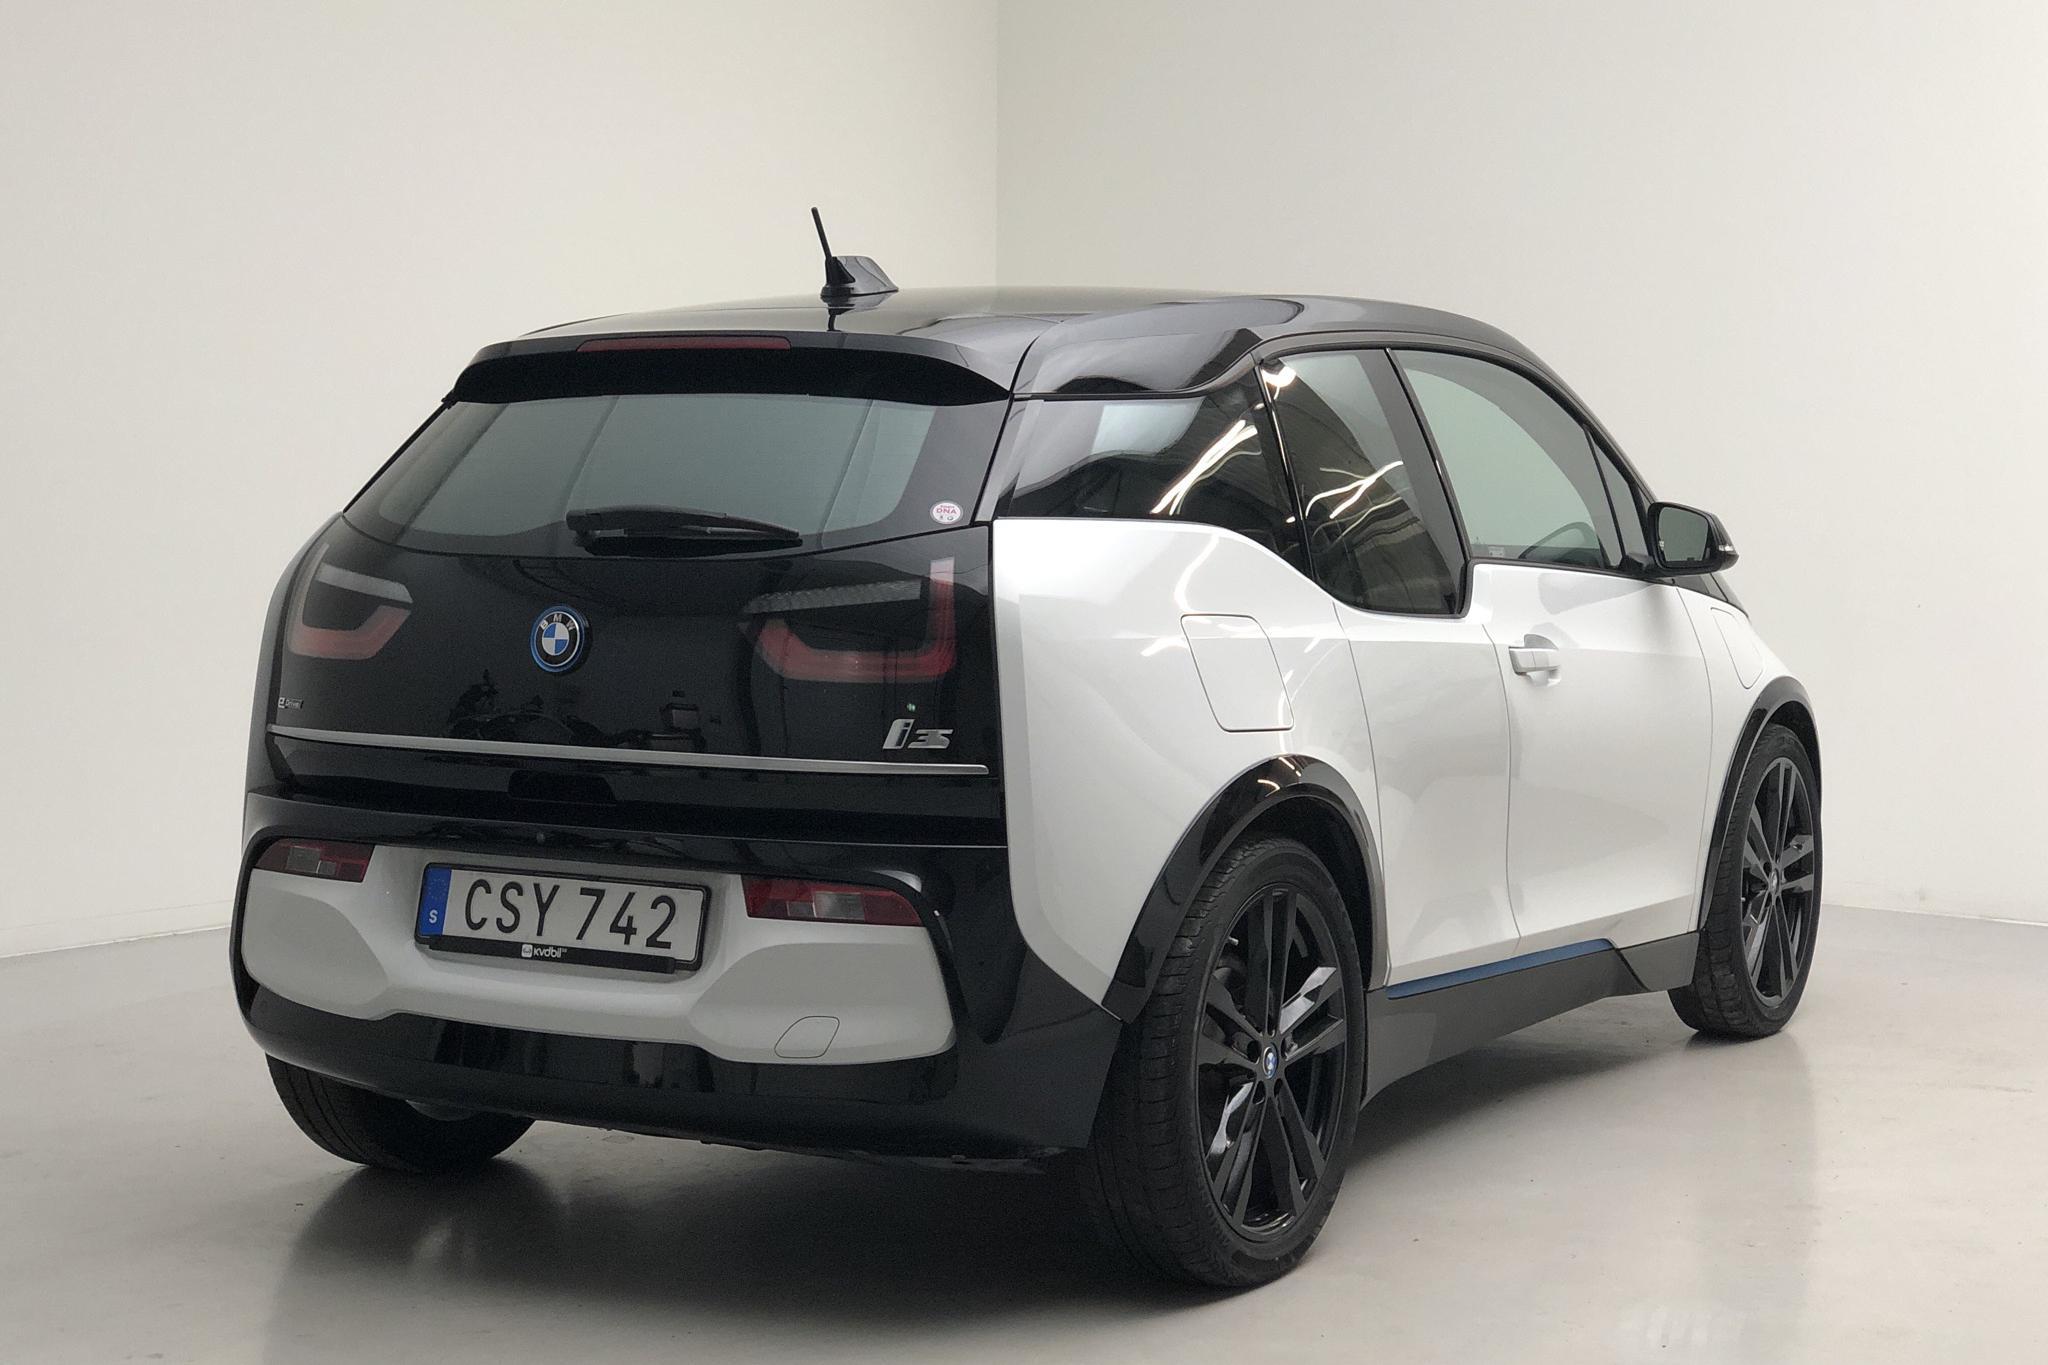 BMW i3s REX 94Ah, I01 (184hk) - 3 577 mil - Automat - vit - 2018